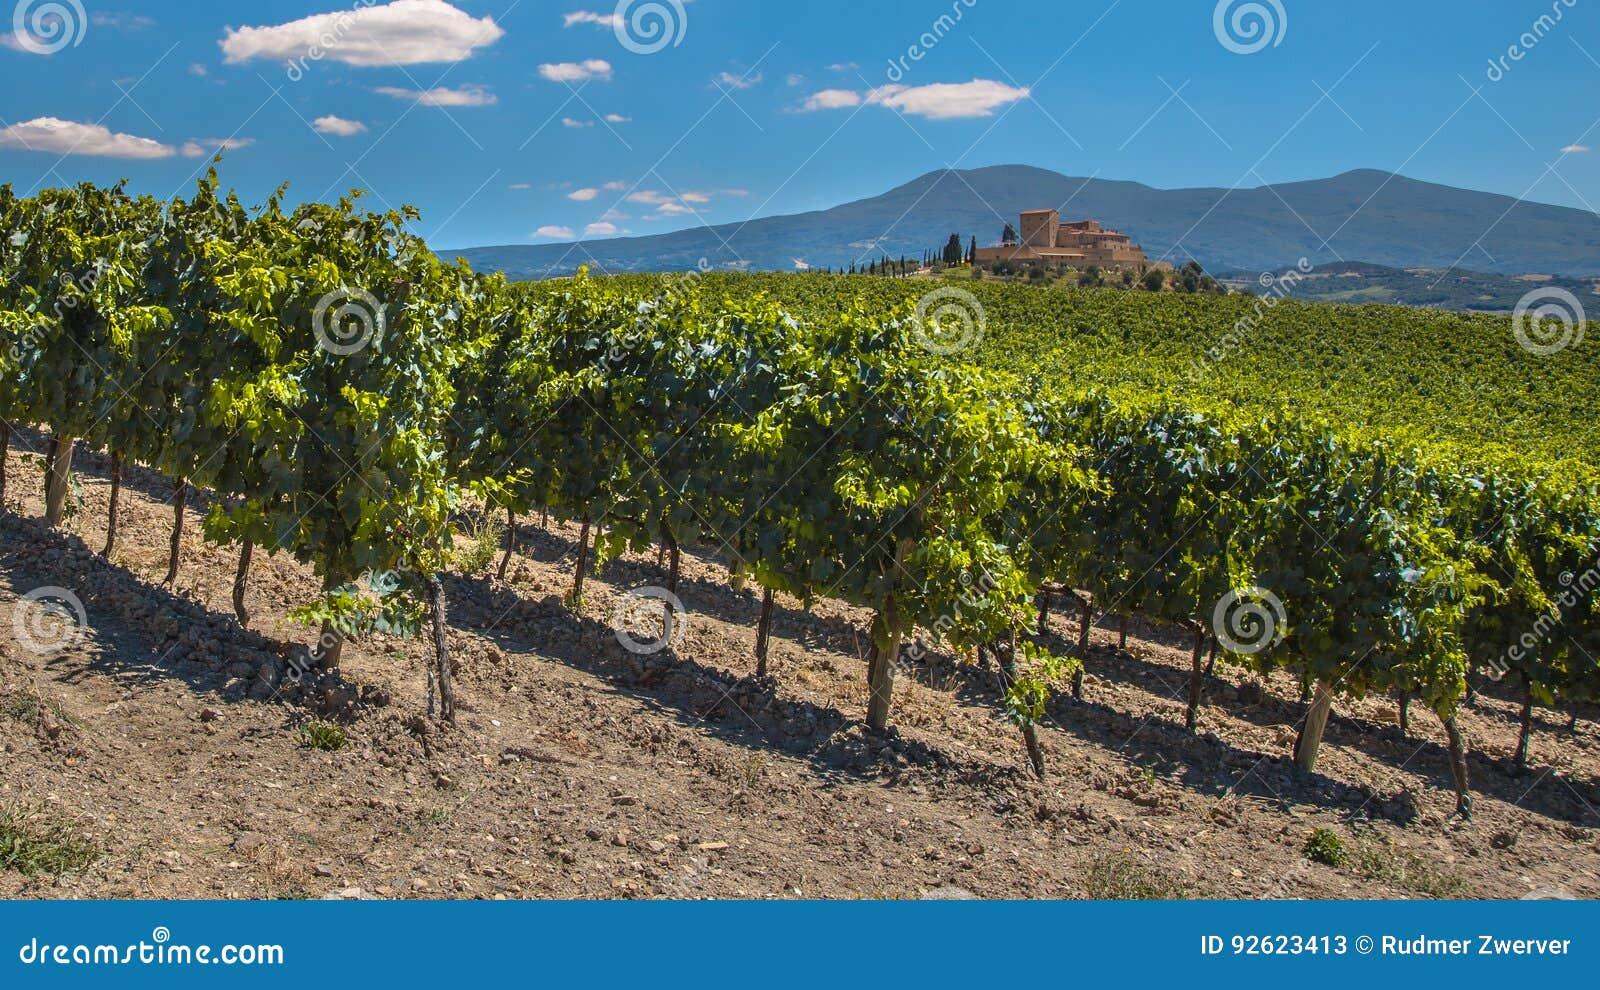 Tuscan Castle Overseeing Vineyards